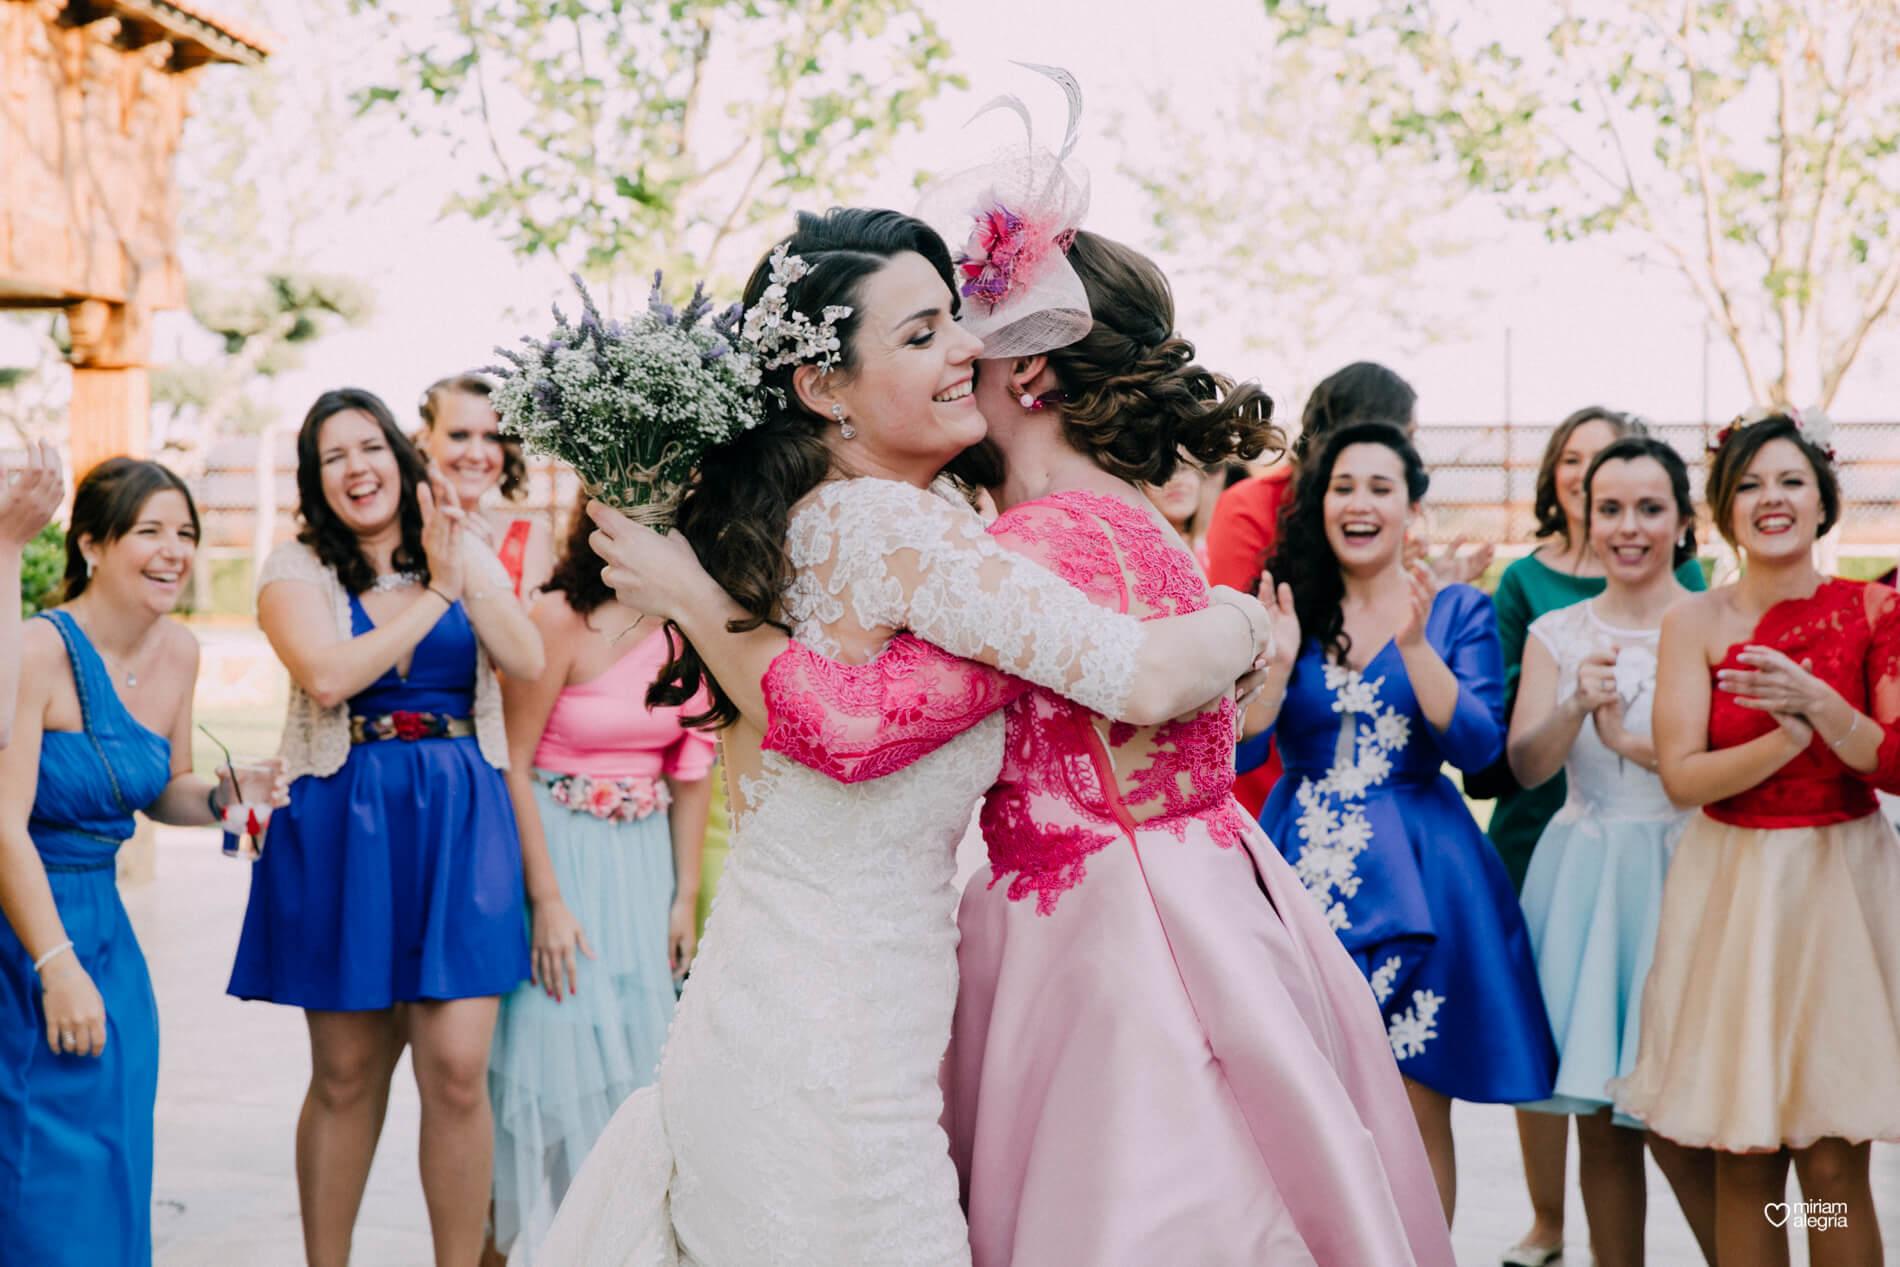 boda-en-finca-jurosa-miriam-alegria-138